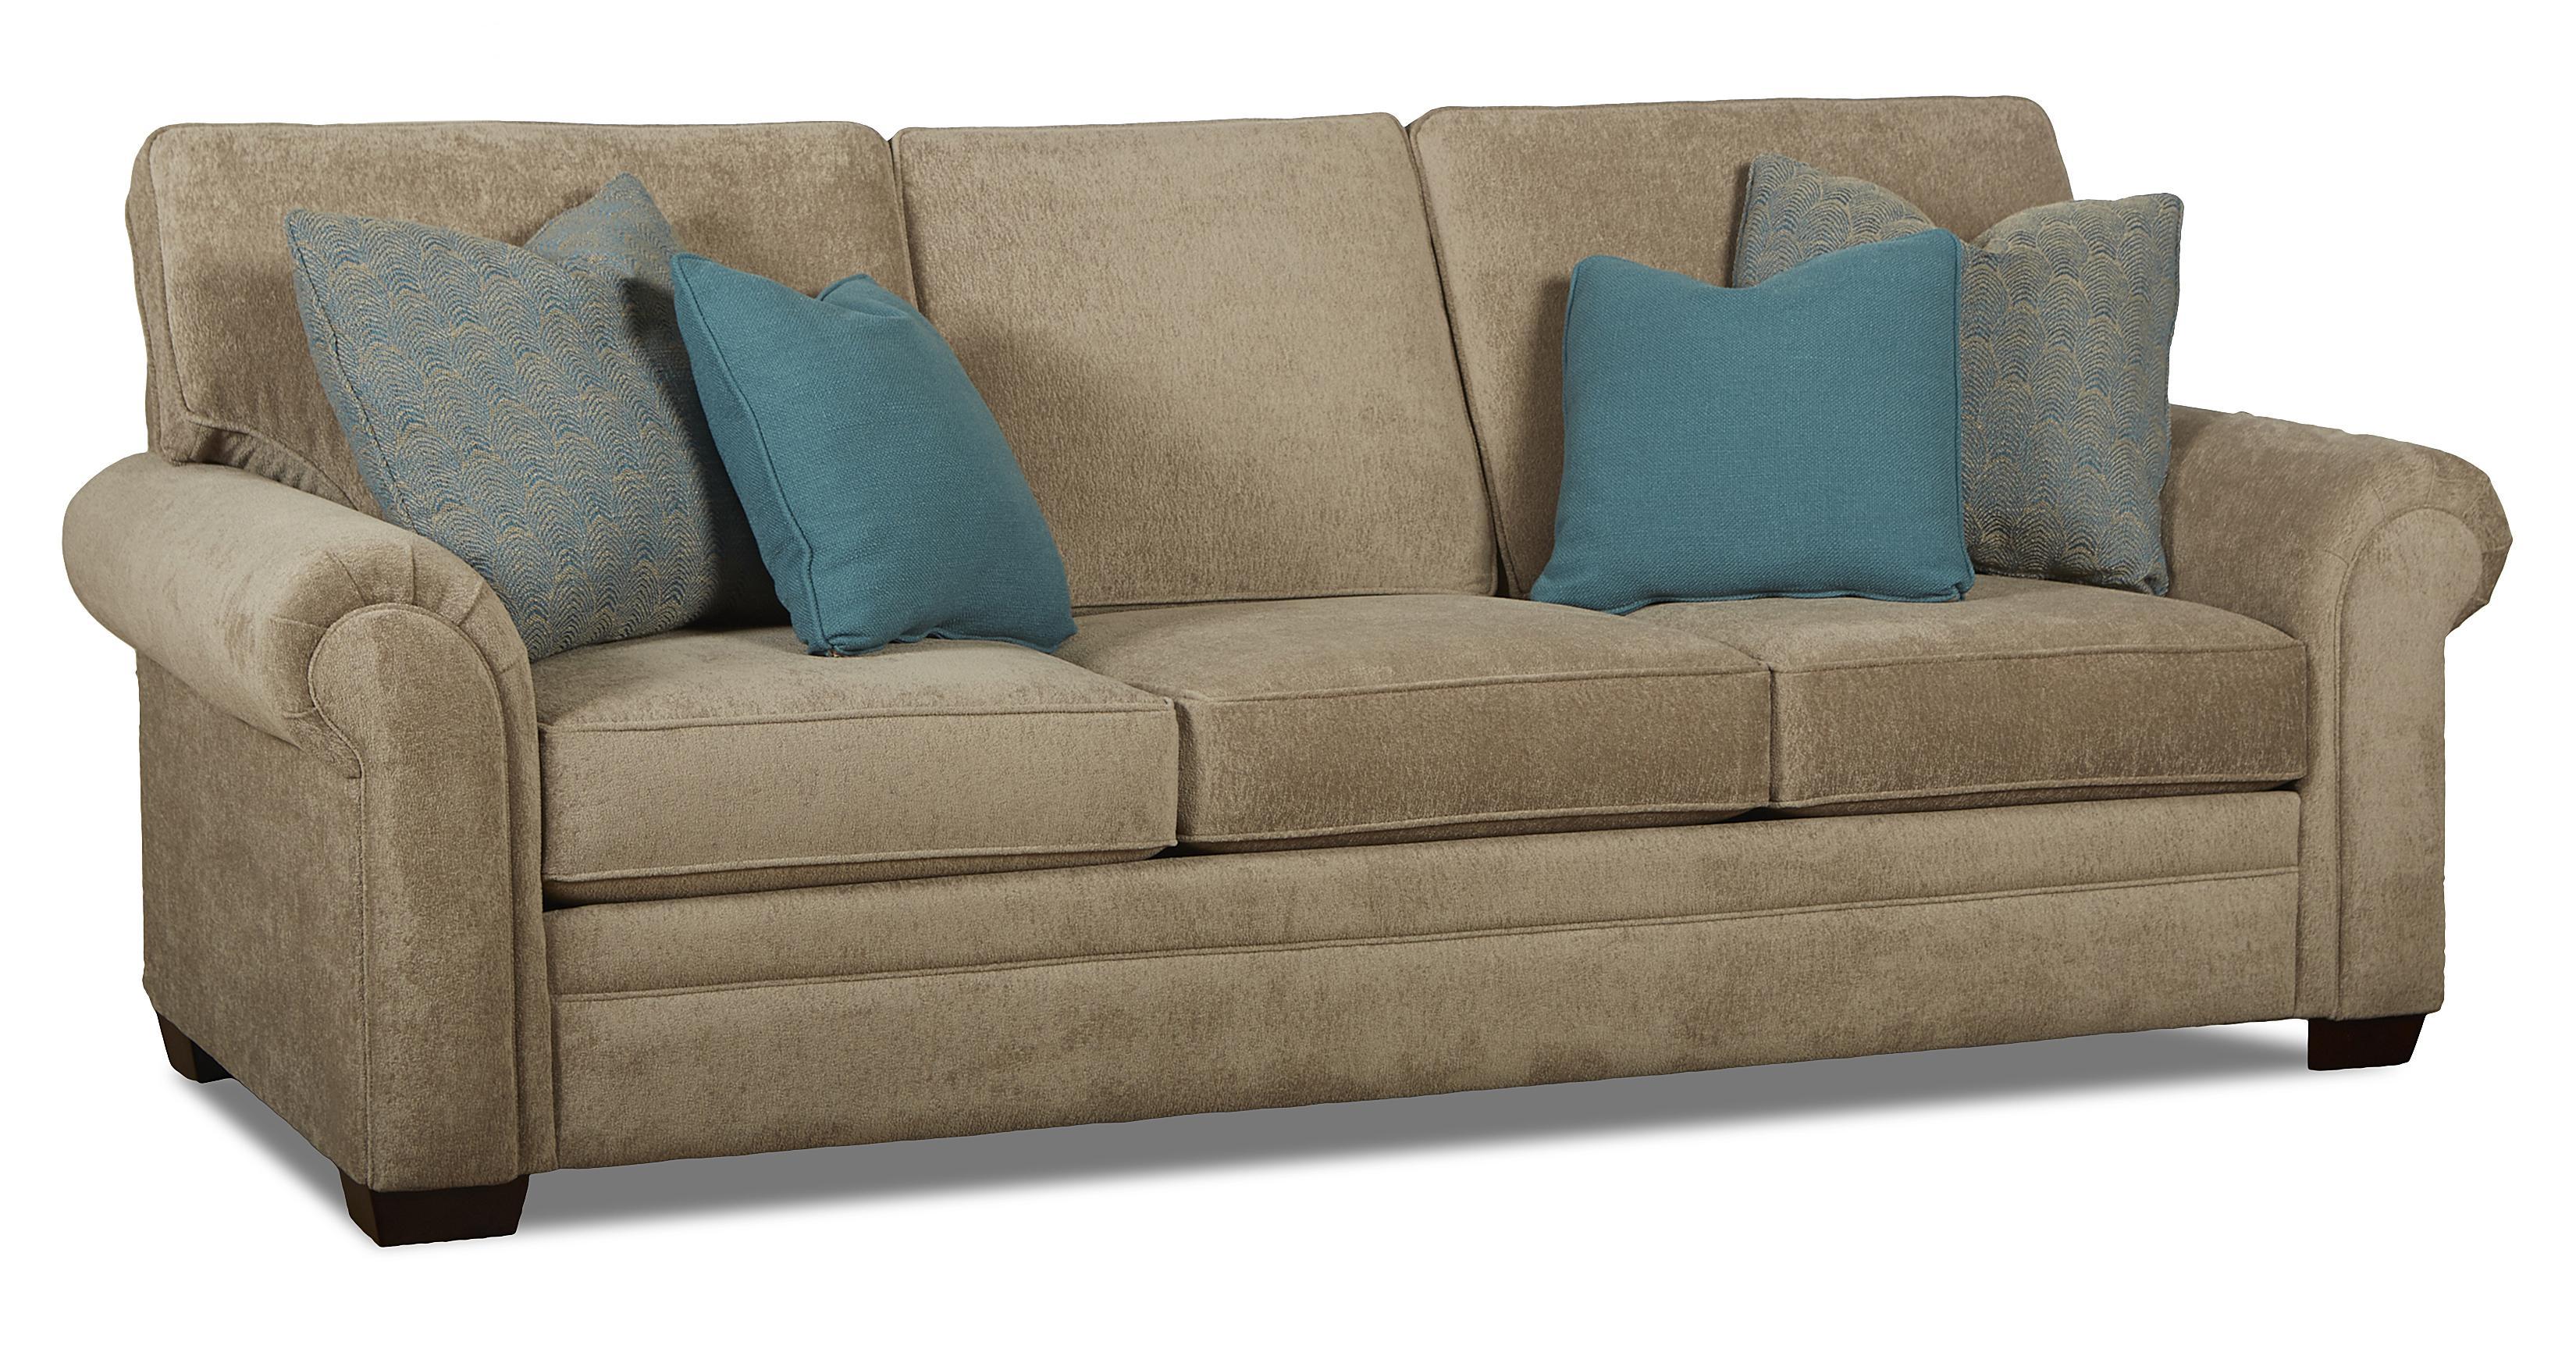 Ronaldo Traditional Air Coil Mattress Sleeper Sofa With